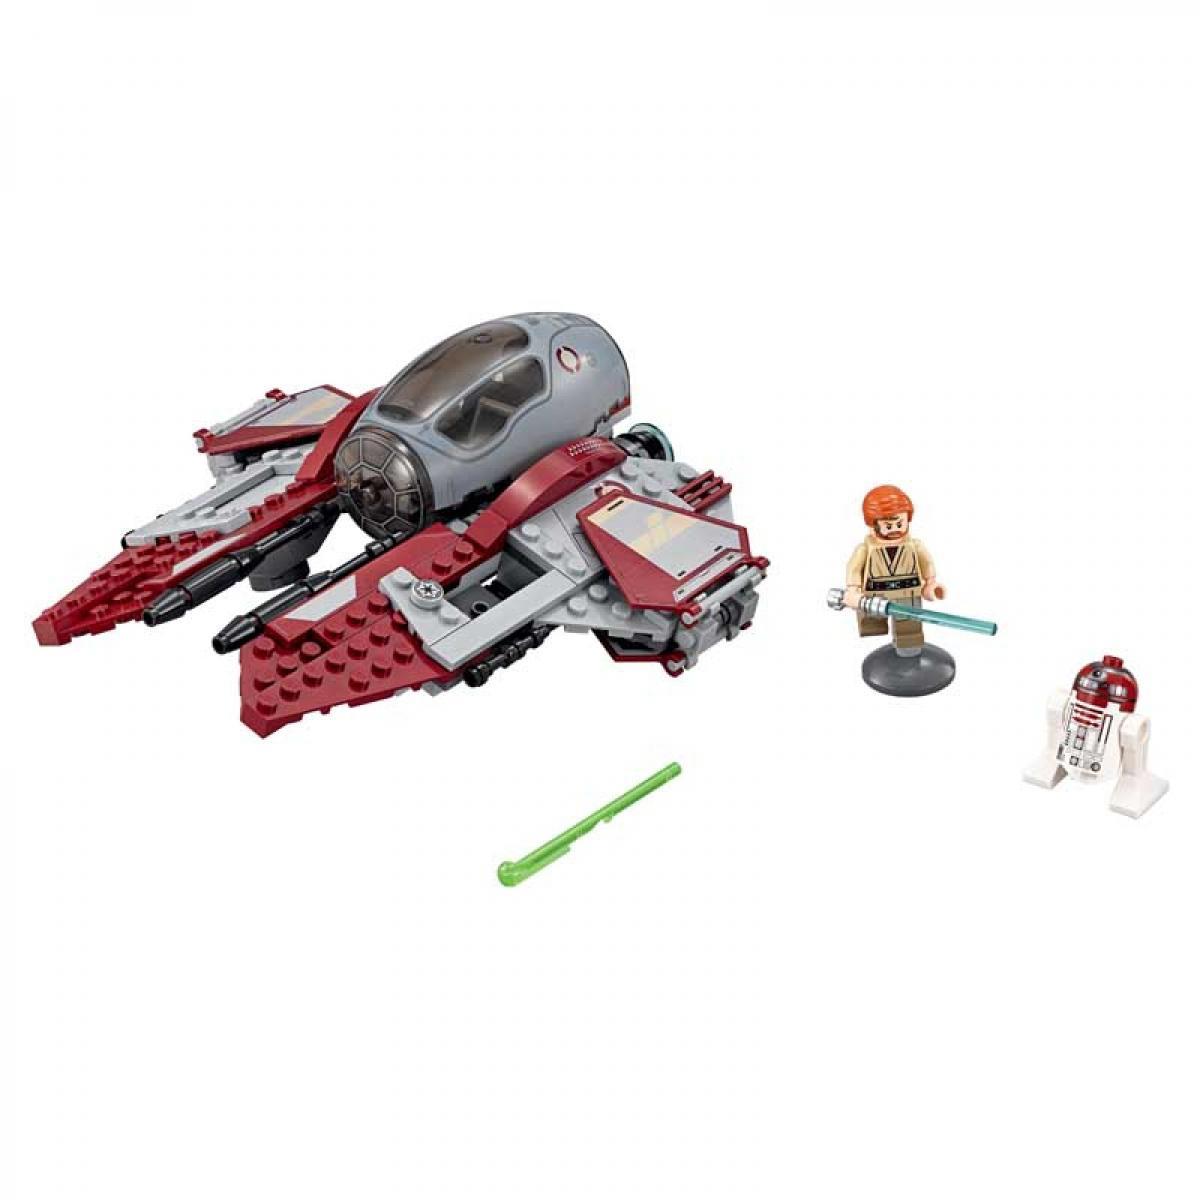 Ac-Deco Lego Star Wars - Obi-Wan's Jedi - Jouet pour enfant